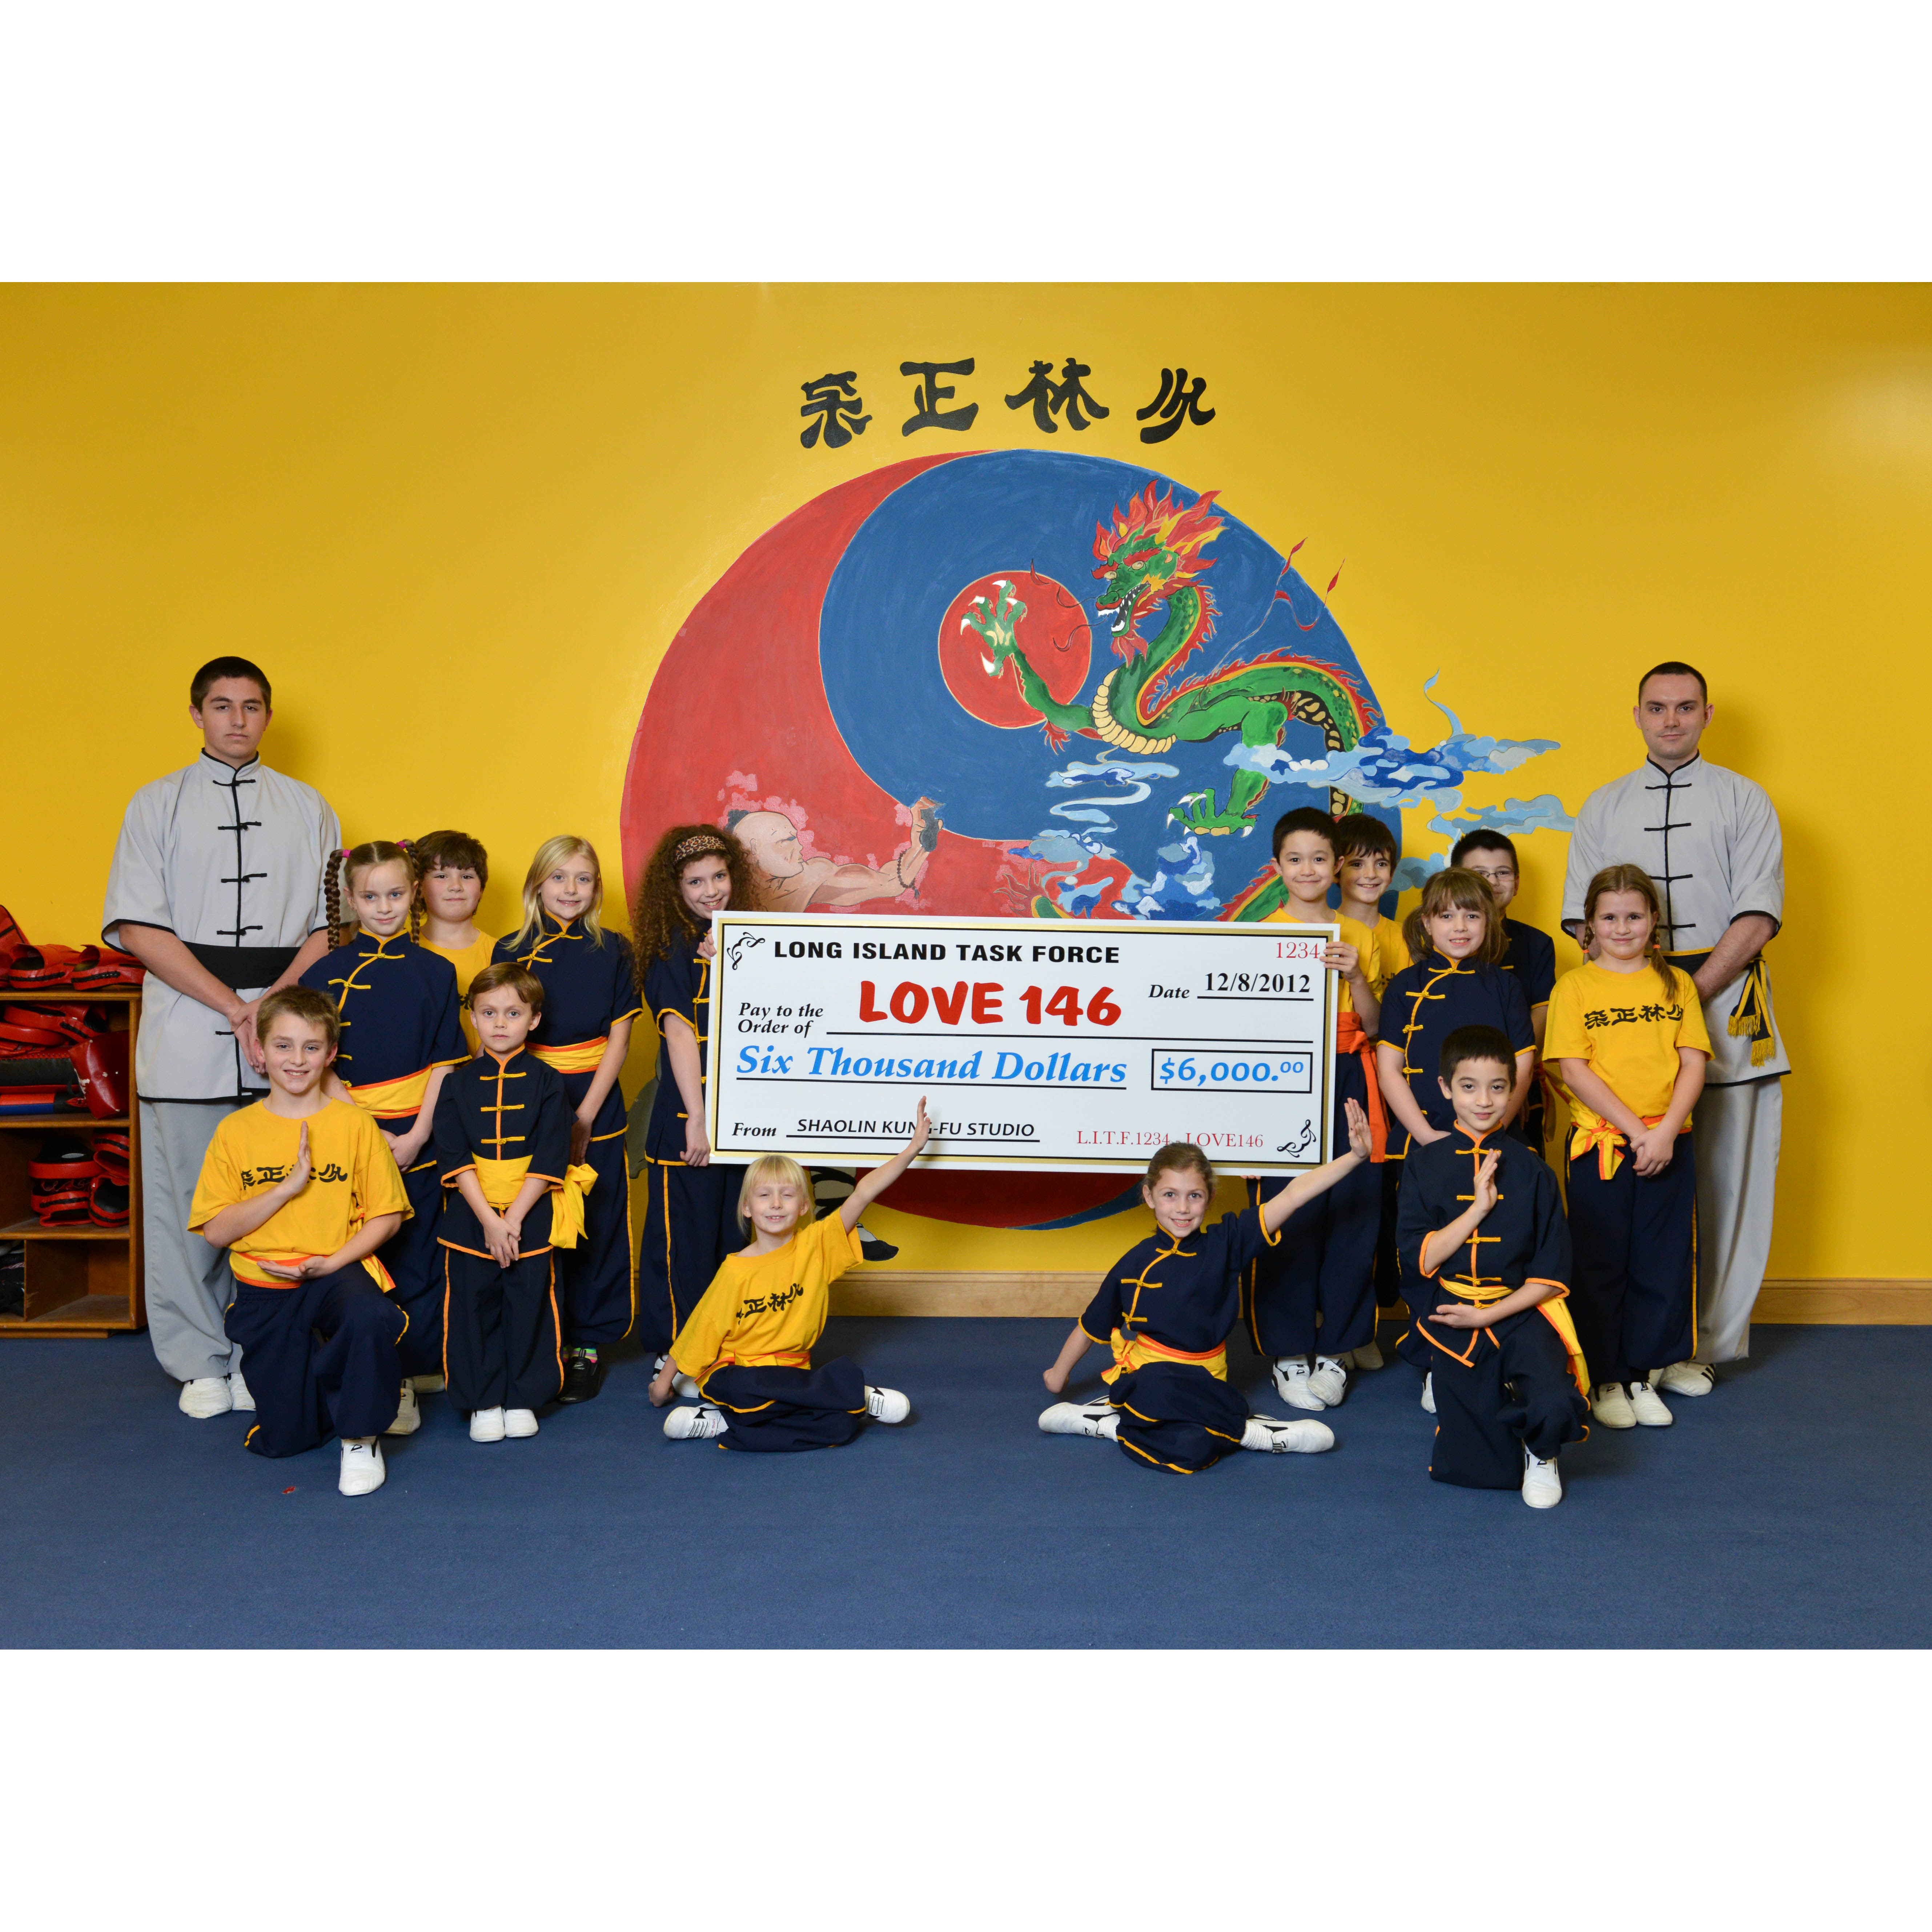 Shaolin Kung Fu & Fitness